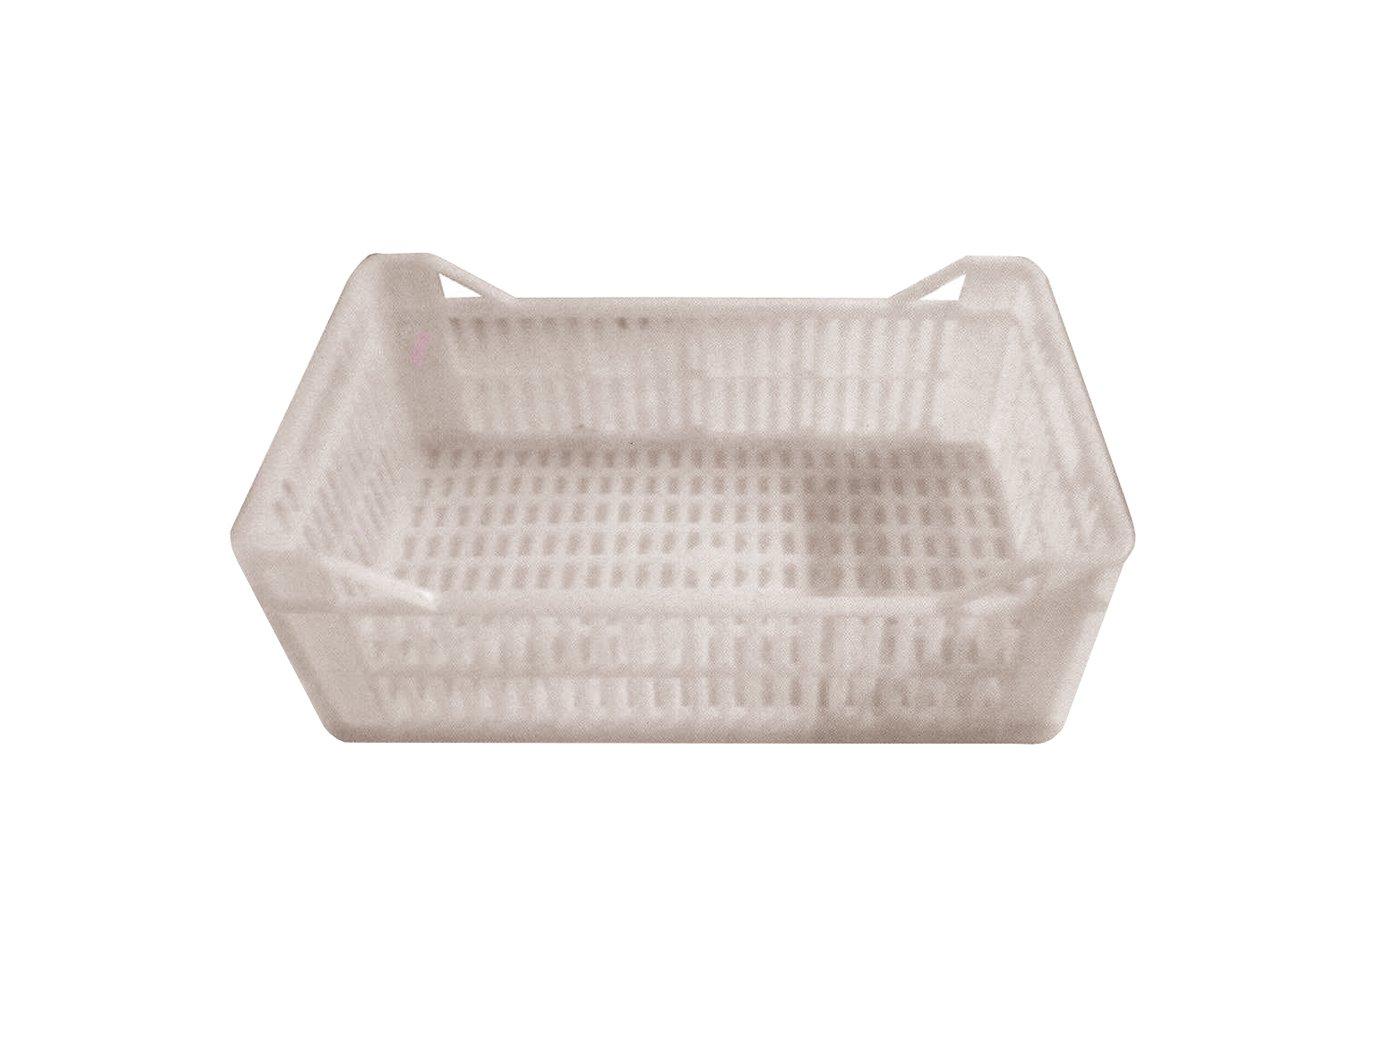 ggg profesional Congelador de plantilla caja, plástico, 51,5 x 31 ...